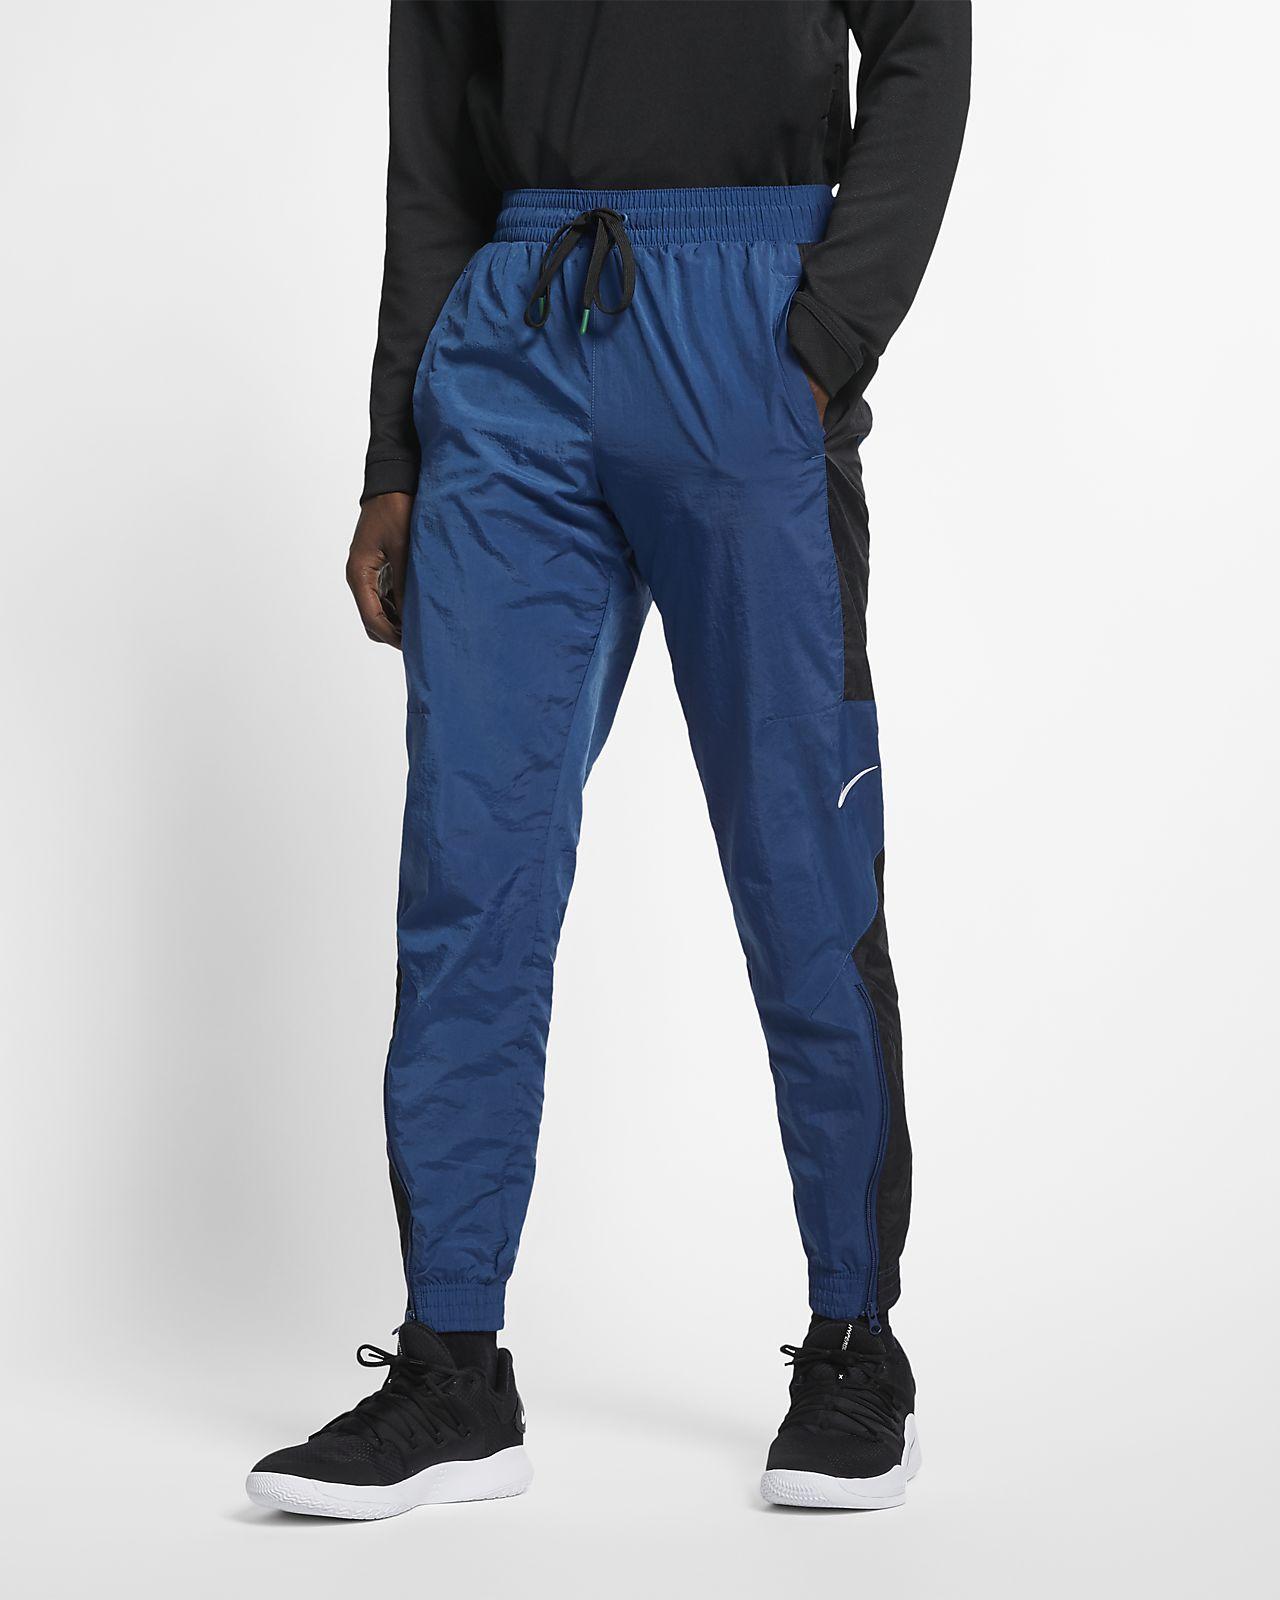 Nike 男子篮球长裤